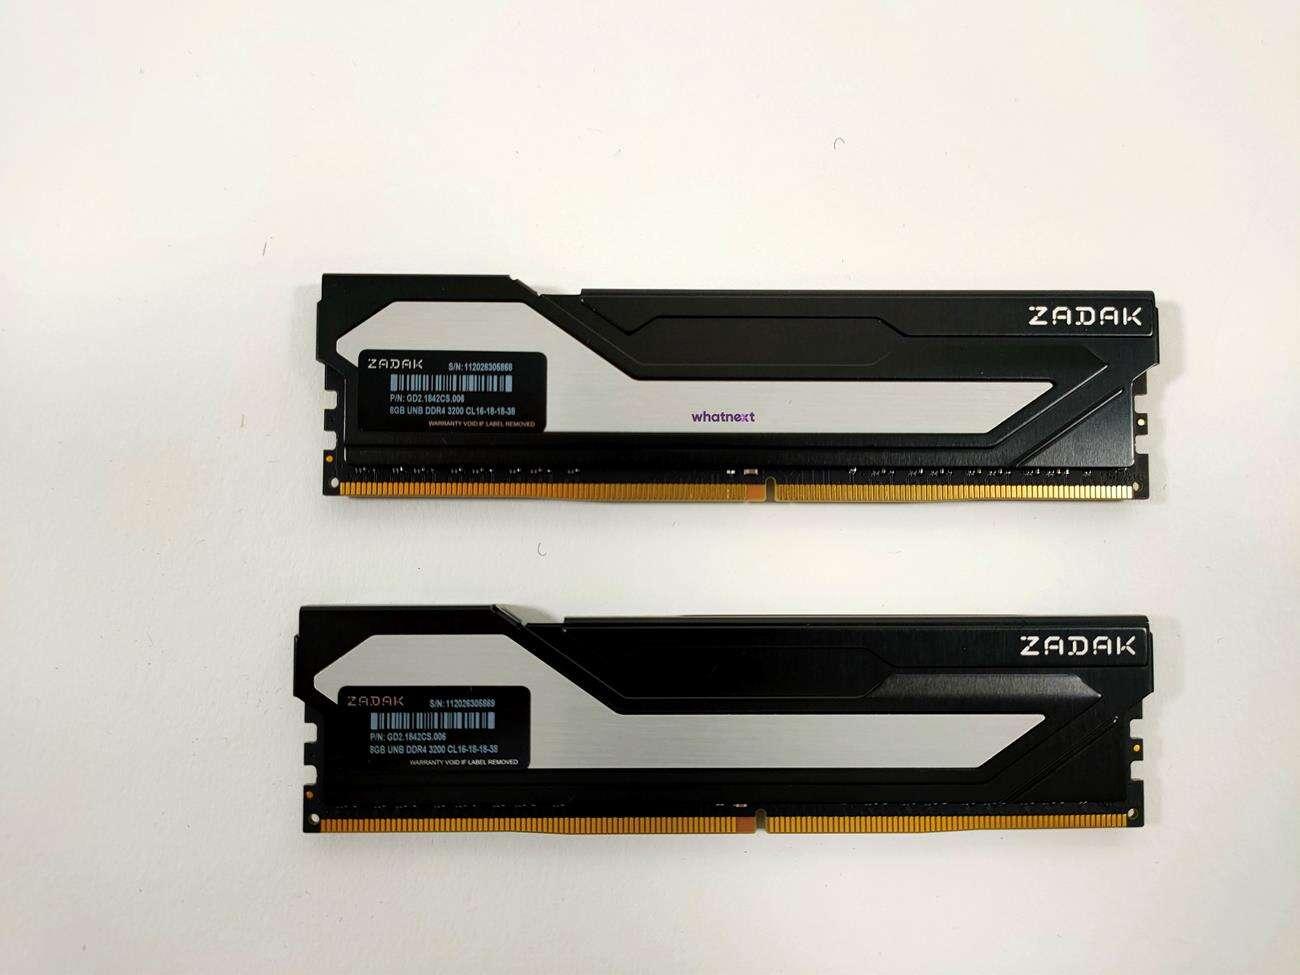 test Zadak Twist 2x 8GB 3200 MHz, recenzja Zadak Twist 2x 8GB 3200 MHz, review Zadak Twist 2x 8GB 3200 MHz, opinia Zadak Twist 2x 8GB 3200 MHz